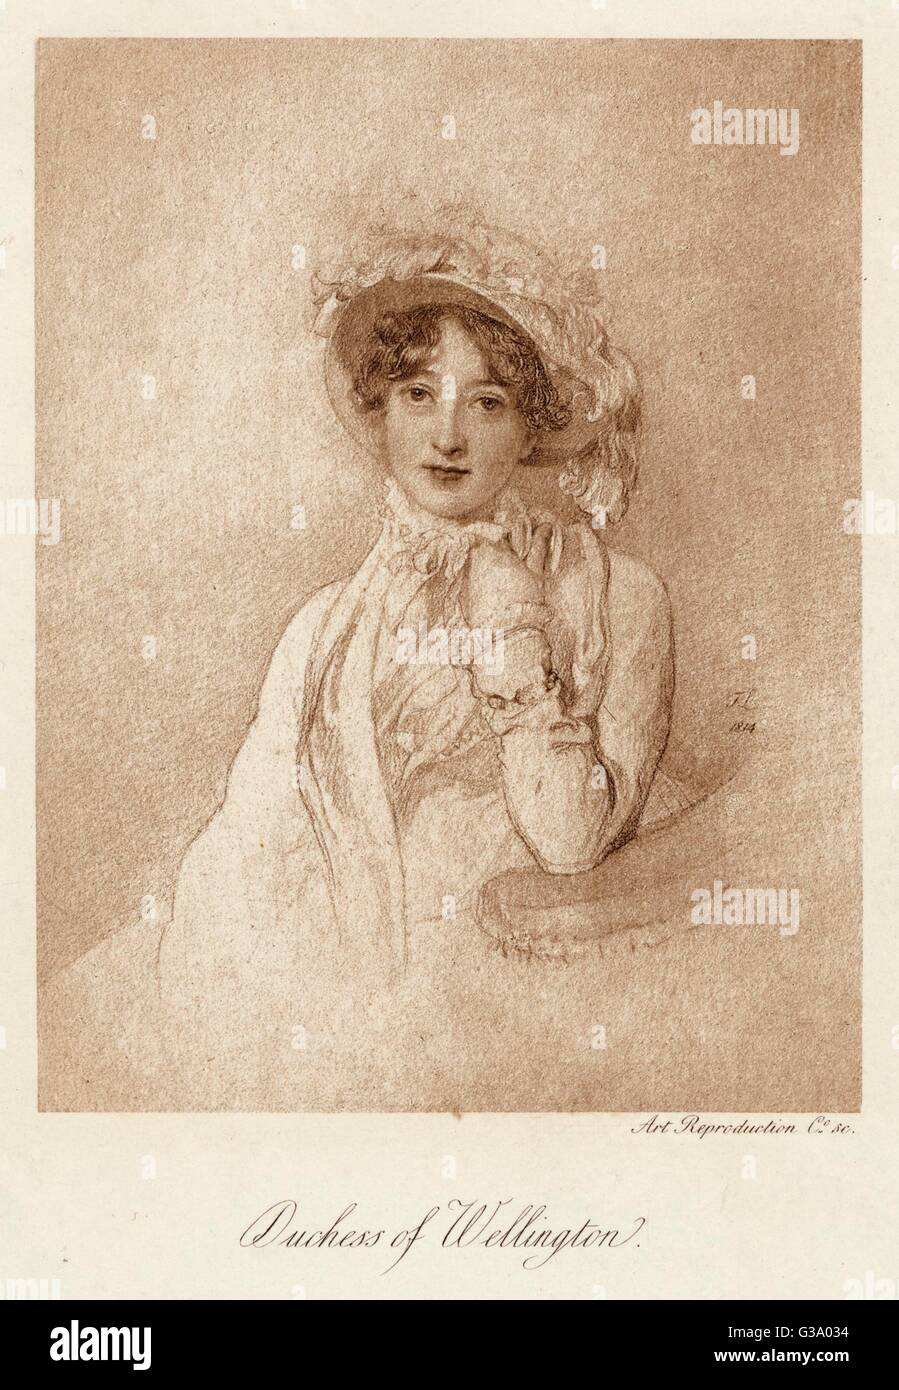 CATHERINE PAKENHAM DUCHESS of WELLINGTON  'Kitty' Wife of 1st Duke of Wellington     Date: 1773 - 1831 - Stock Image